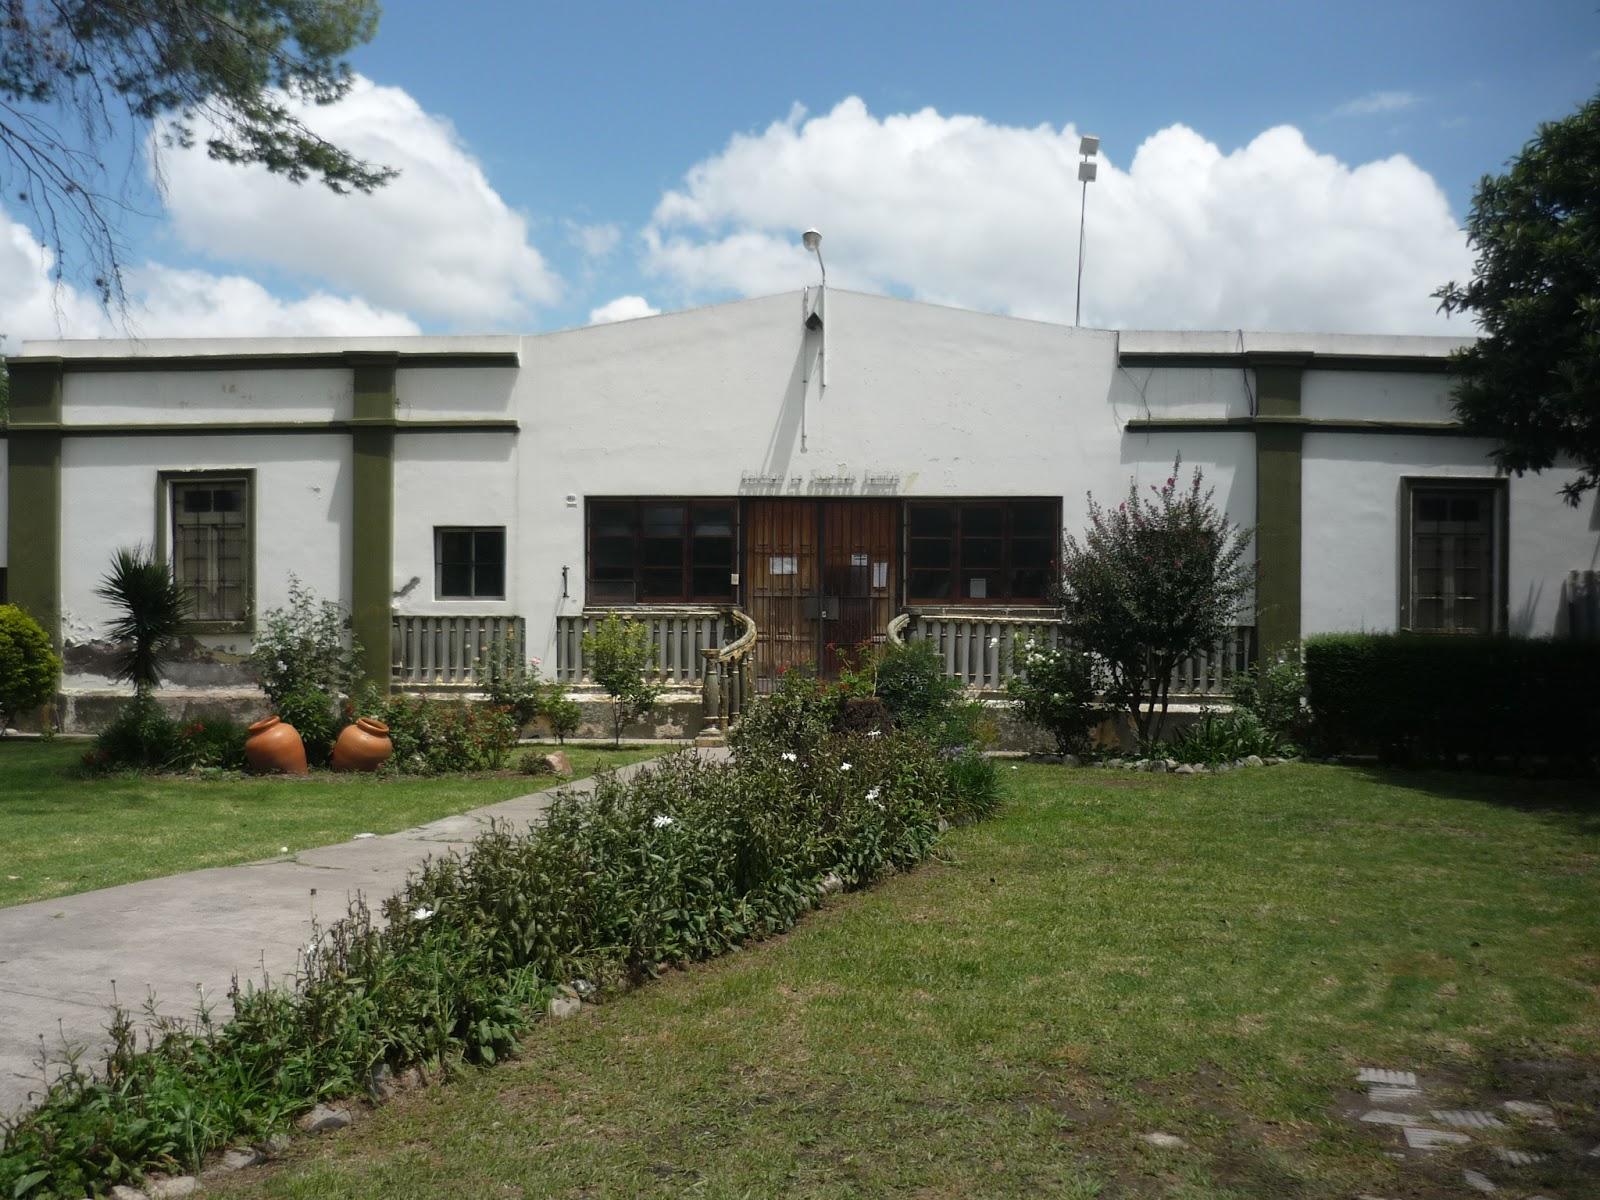 Salta mi querida provincia for Colegio sagrada familia malaga ciudad jardin